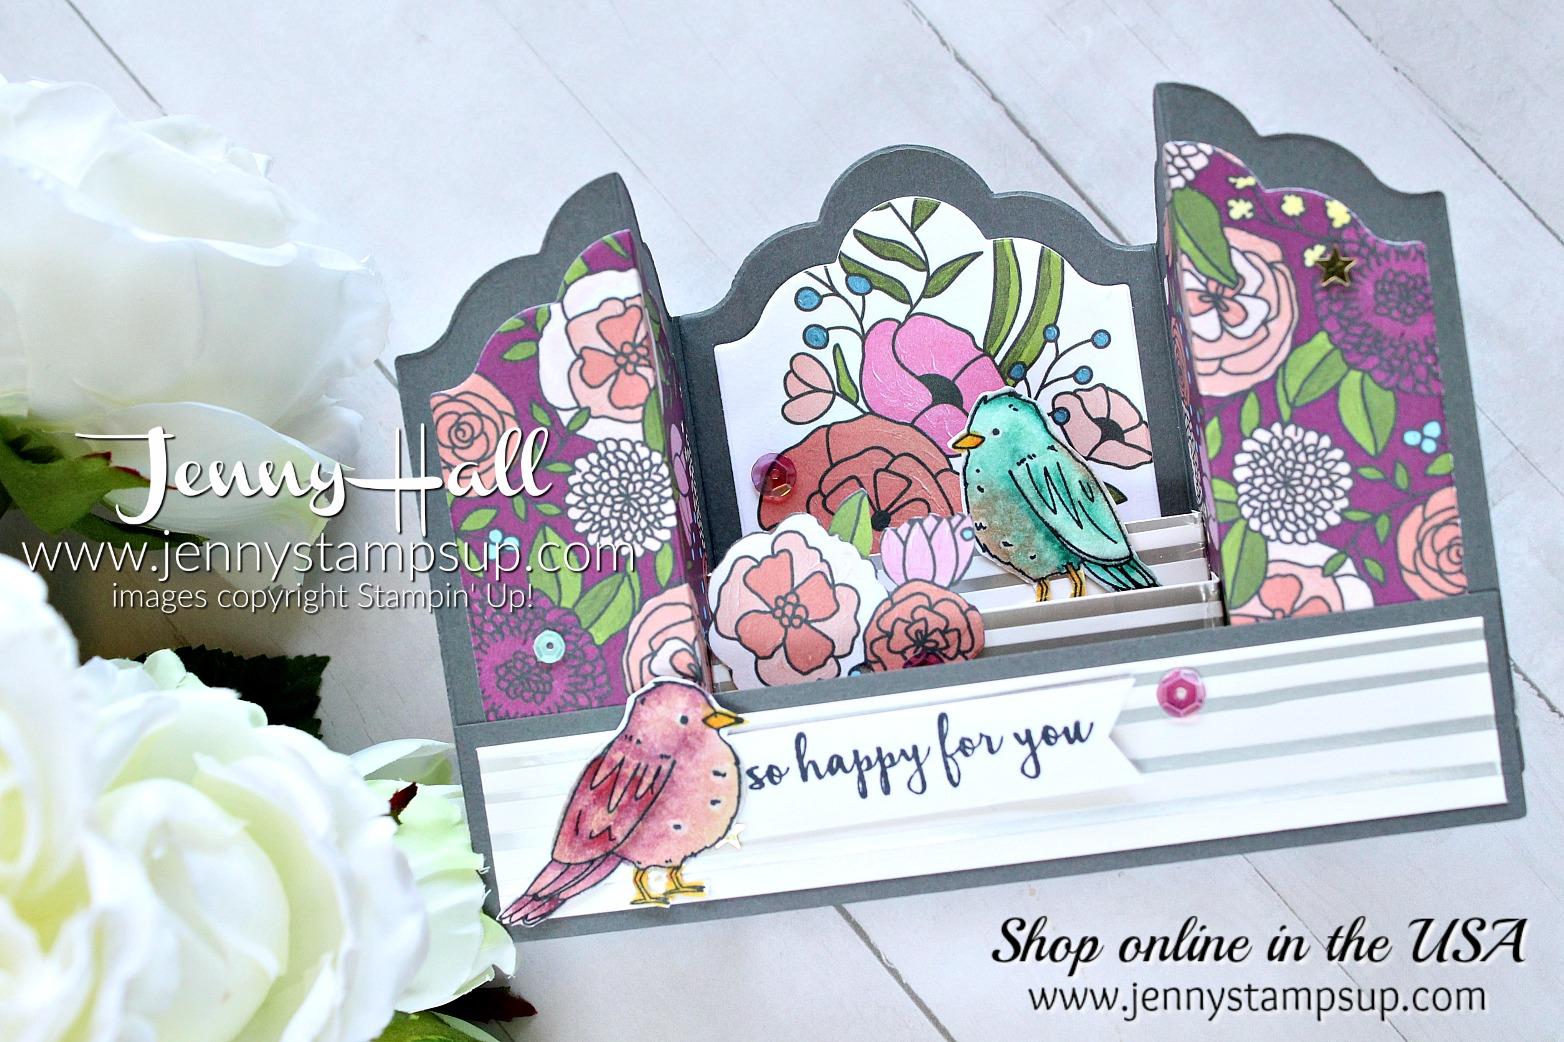 Bridge fold box card created by Jenny Hall for AddINKtive Designs at www.jennyhalldesign.com for #addinktivedesignteam #addinktivedesigns #cardmaking #stampinup #fancyfold #stamping #springtimefoilsdsp #colormehappykit #colormehappy #bridgefold #stampinblends #sweetsoiree #jennyhalldesign #jennystampsup #jennyhall #jennyhallstampinup #youtuber #scrapbooking #crafts #paperembossing #kidfriendlycraft #handmadecard #greetingcard